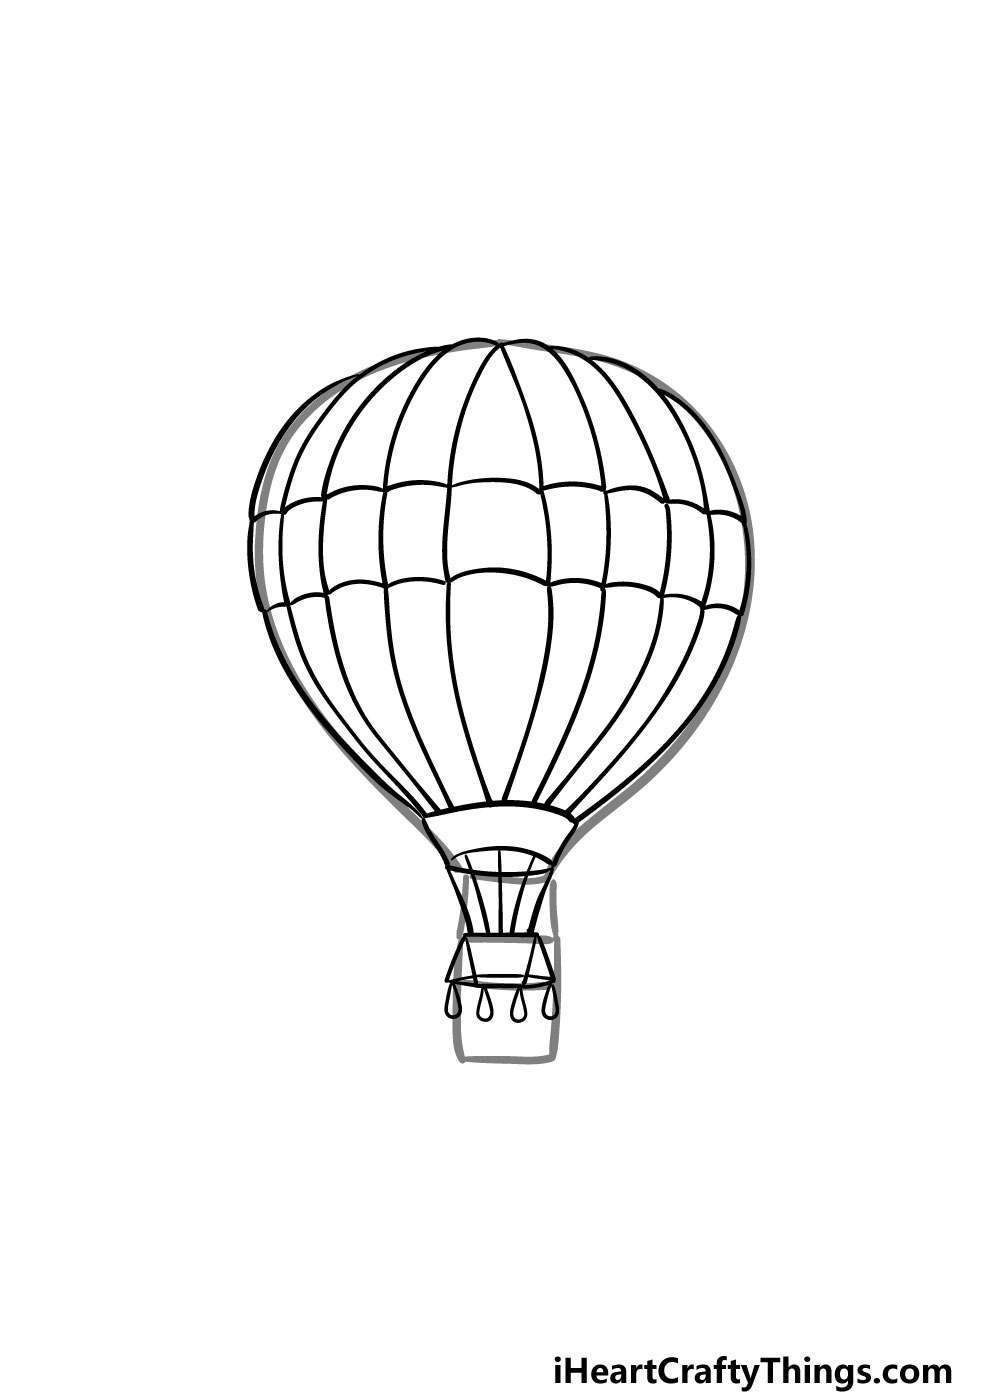 drawing a hot air balloon step 6